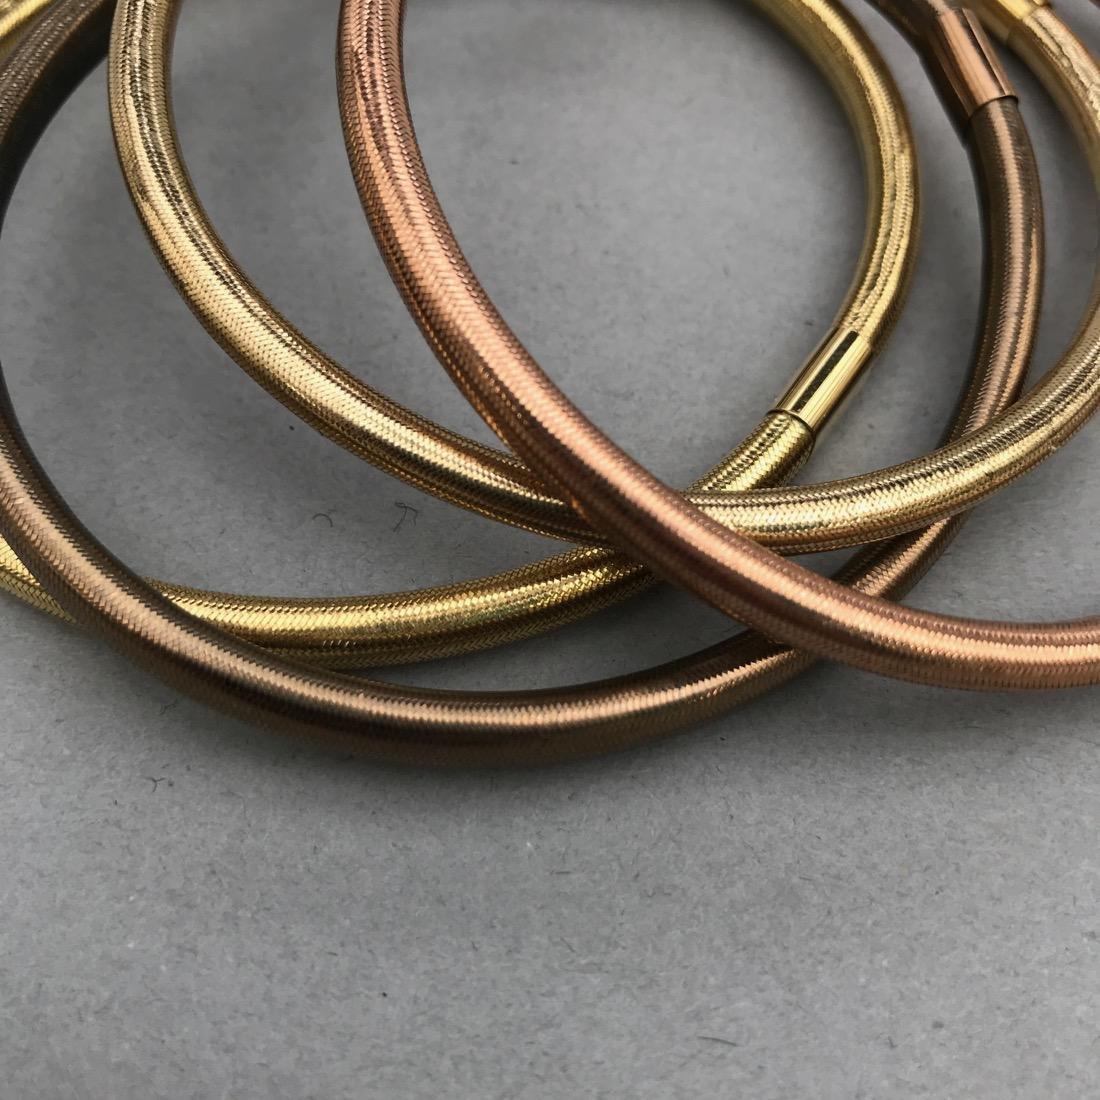 4 14K Gold Woven Flexible Bangle Bracelets - 2